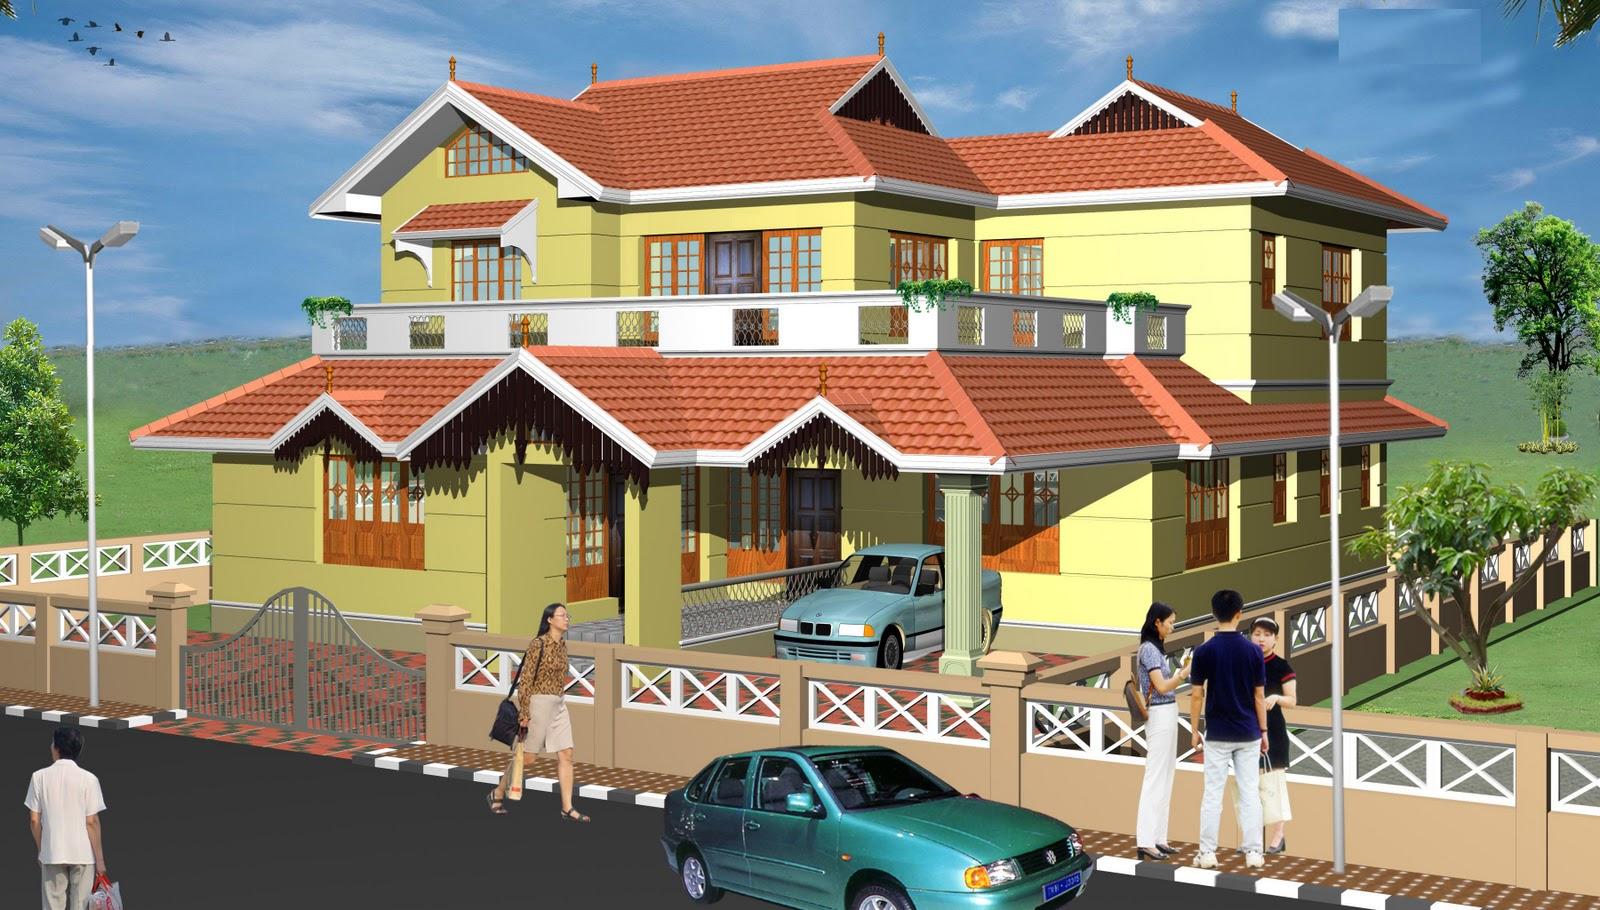 http4bpblogspotcom_q1j0hr8hy58tmmgij39bgi - Designing My Dream Home